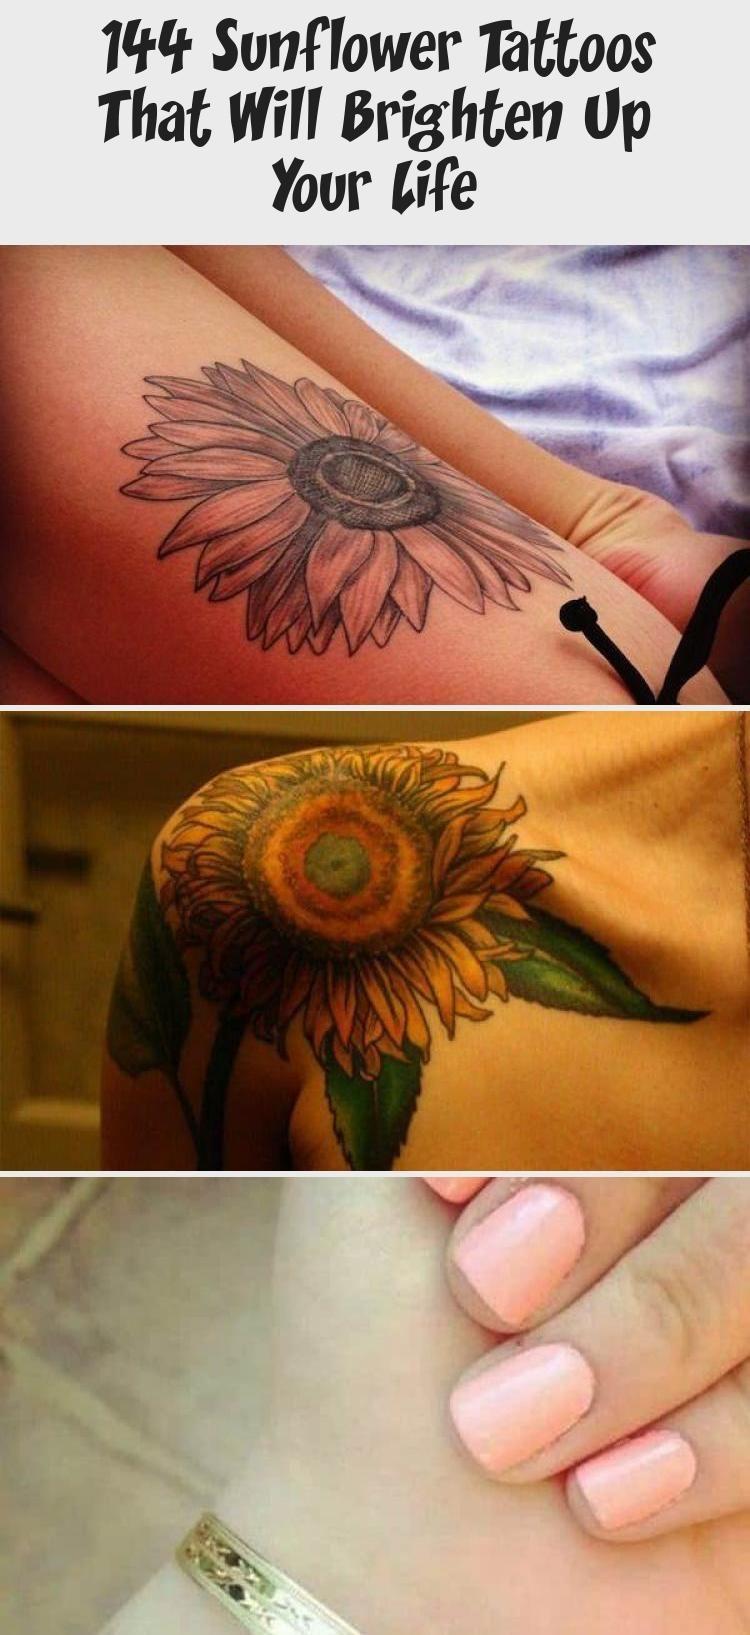 Photo of 144 Sunflower Tattoos That Will Brighten Up Your Life #Wildsunflowertattoos #sun…